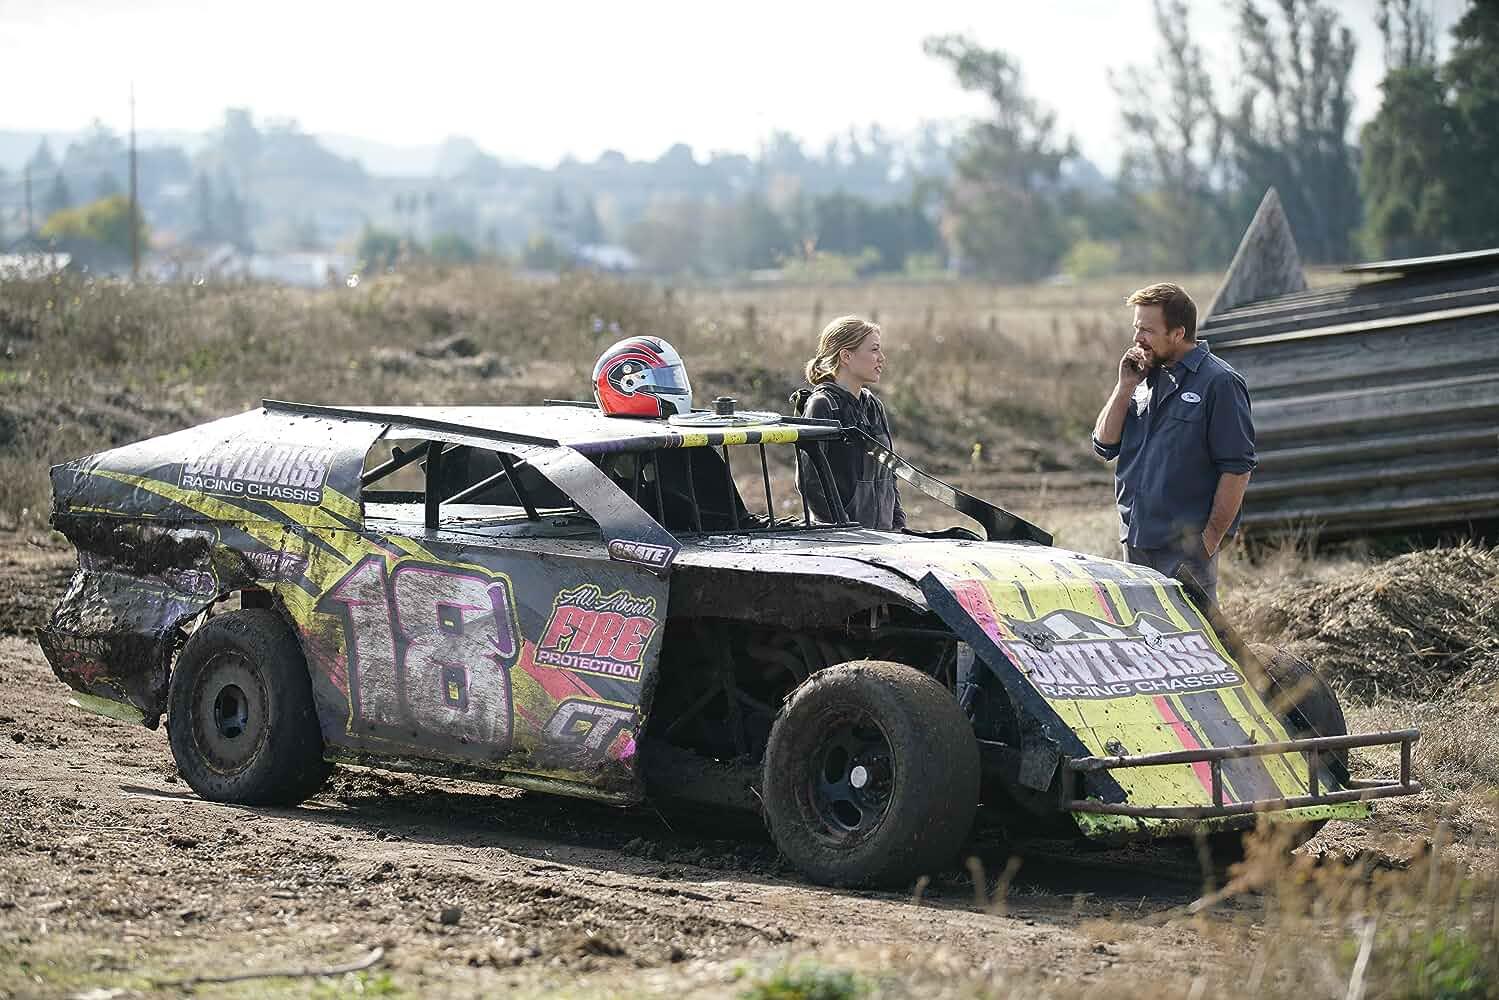 Sean Patrick Flanery and Grace Van Dien in Lady Driver (2020)